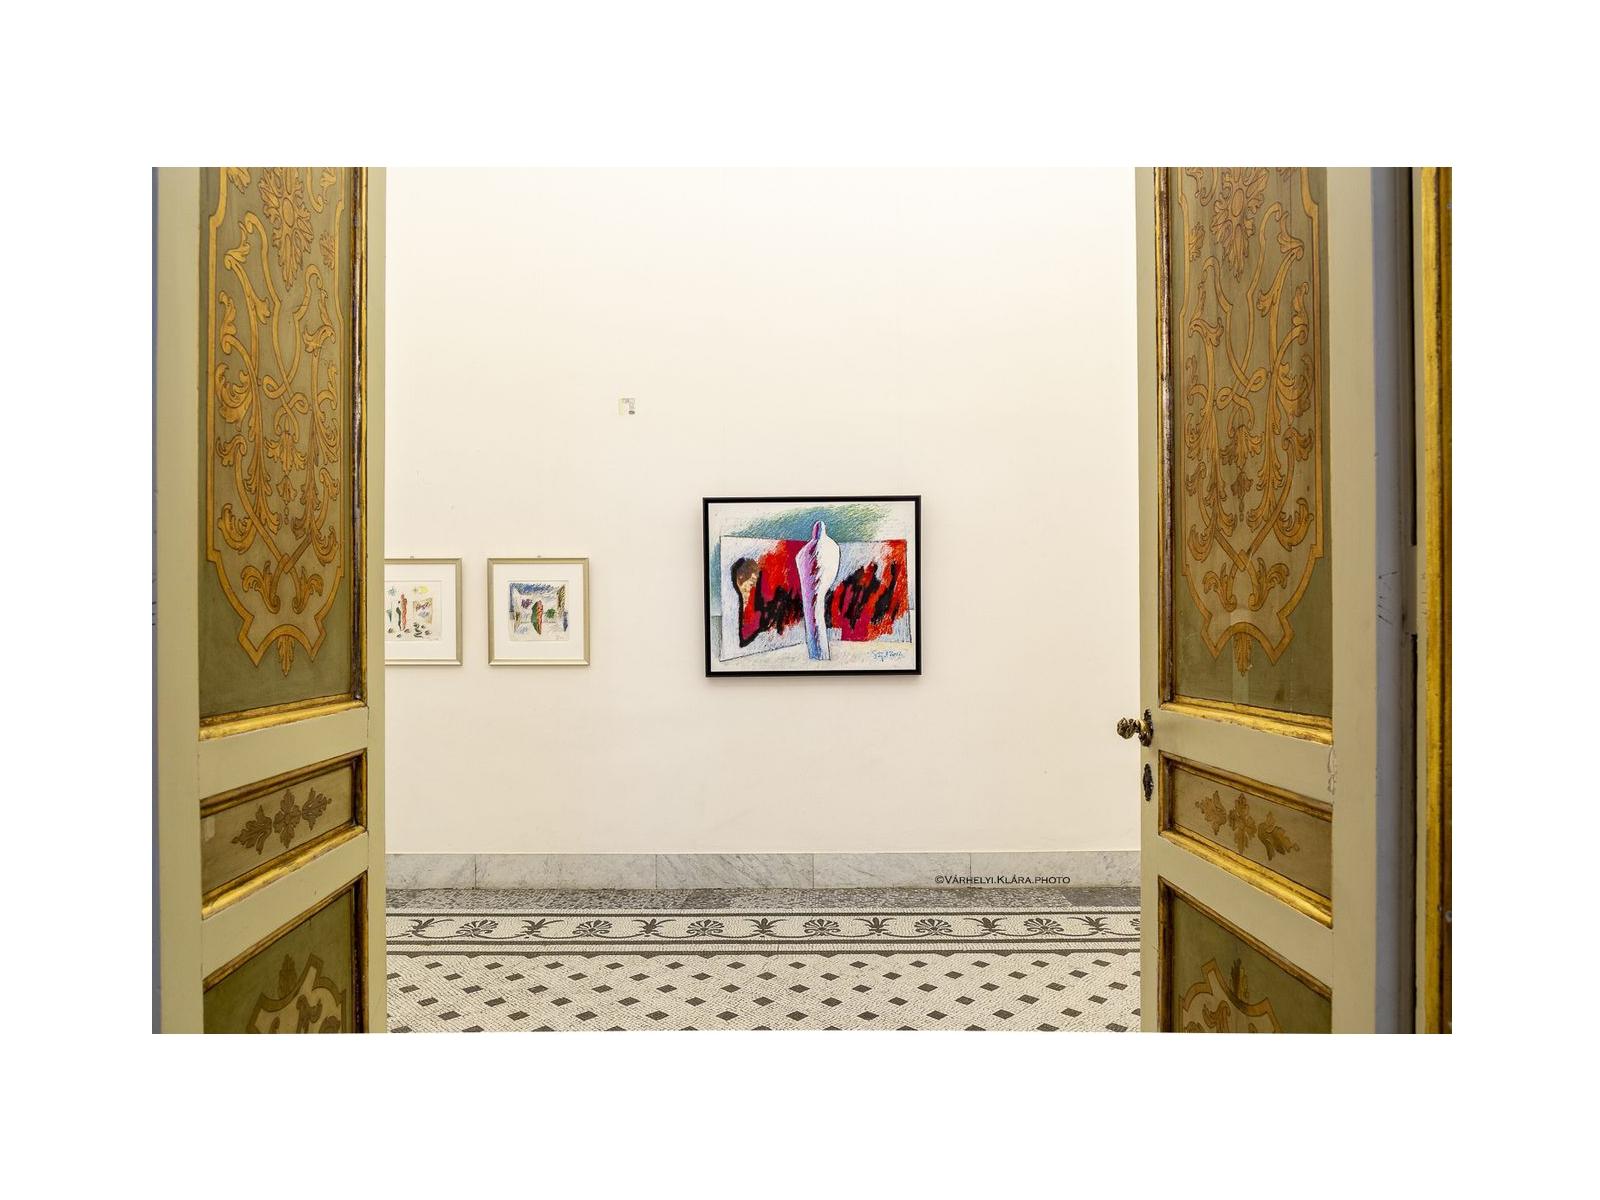 Karl-Stengel.-Con-cuore-puro.-Exhibition-view-at-Accademia-dUngheria-Roma-2020.-Photo-Klára-Várhelyi-_3_